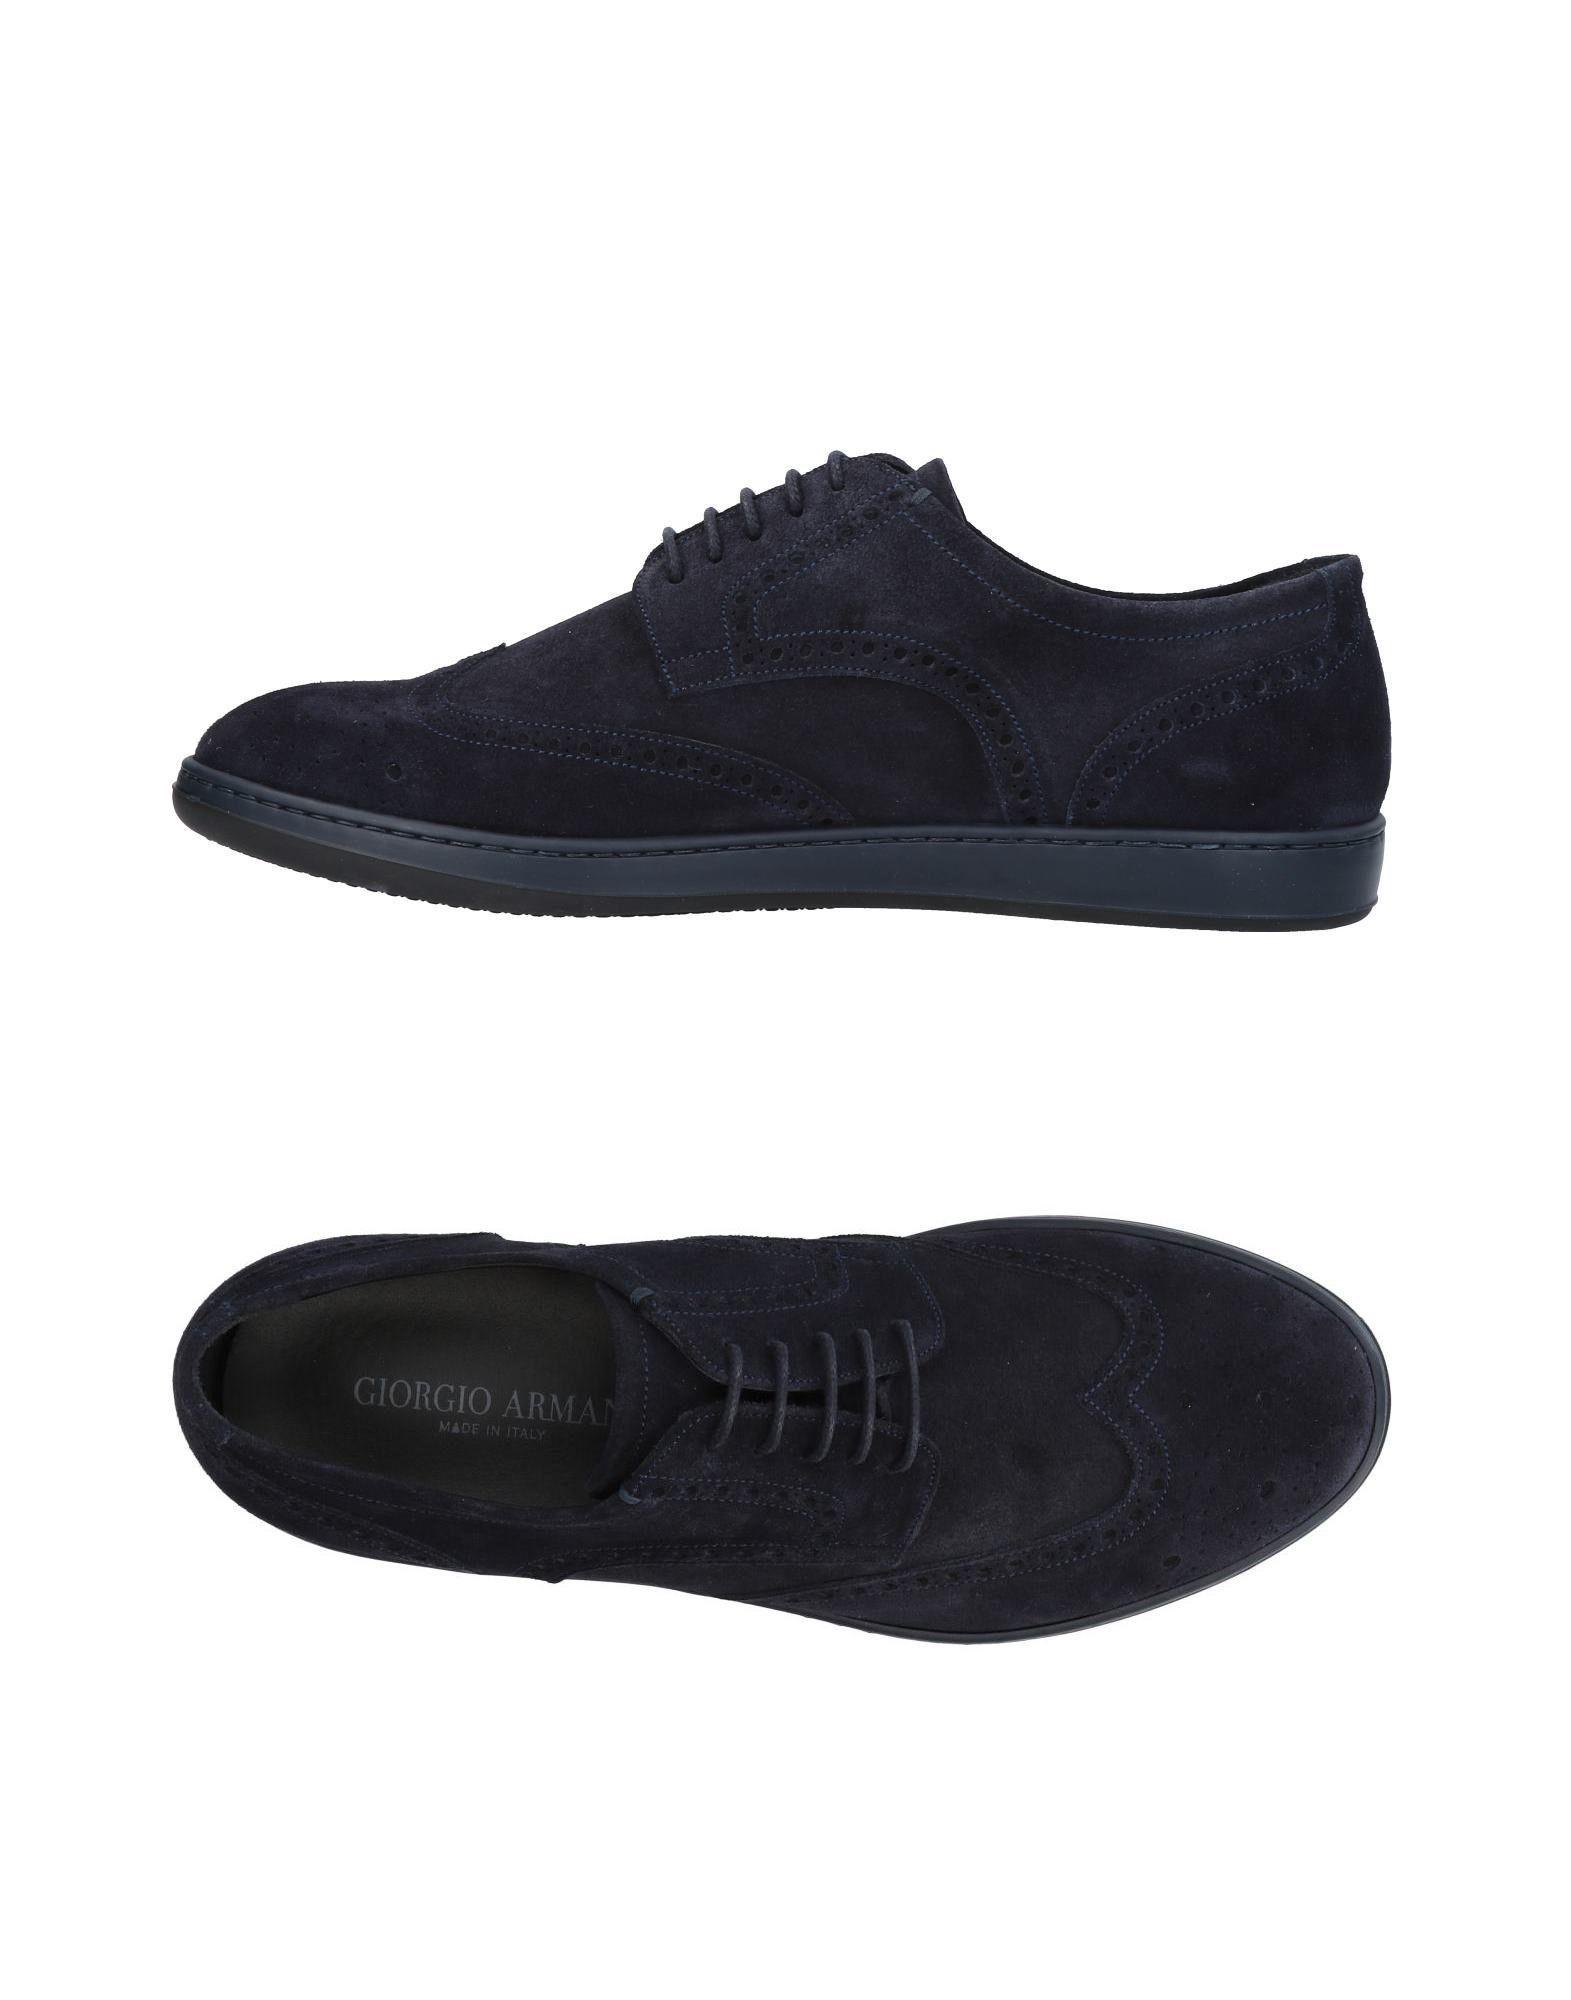 Sneakers Giorgio Armani Homme - Sneakers Giorgio Armani  Bleu foncé Meilleur modèle de vente